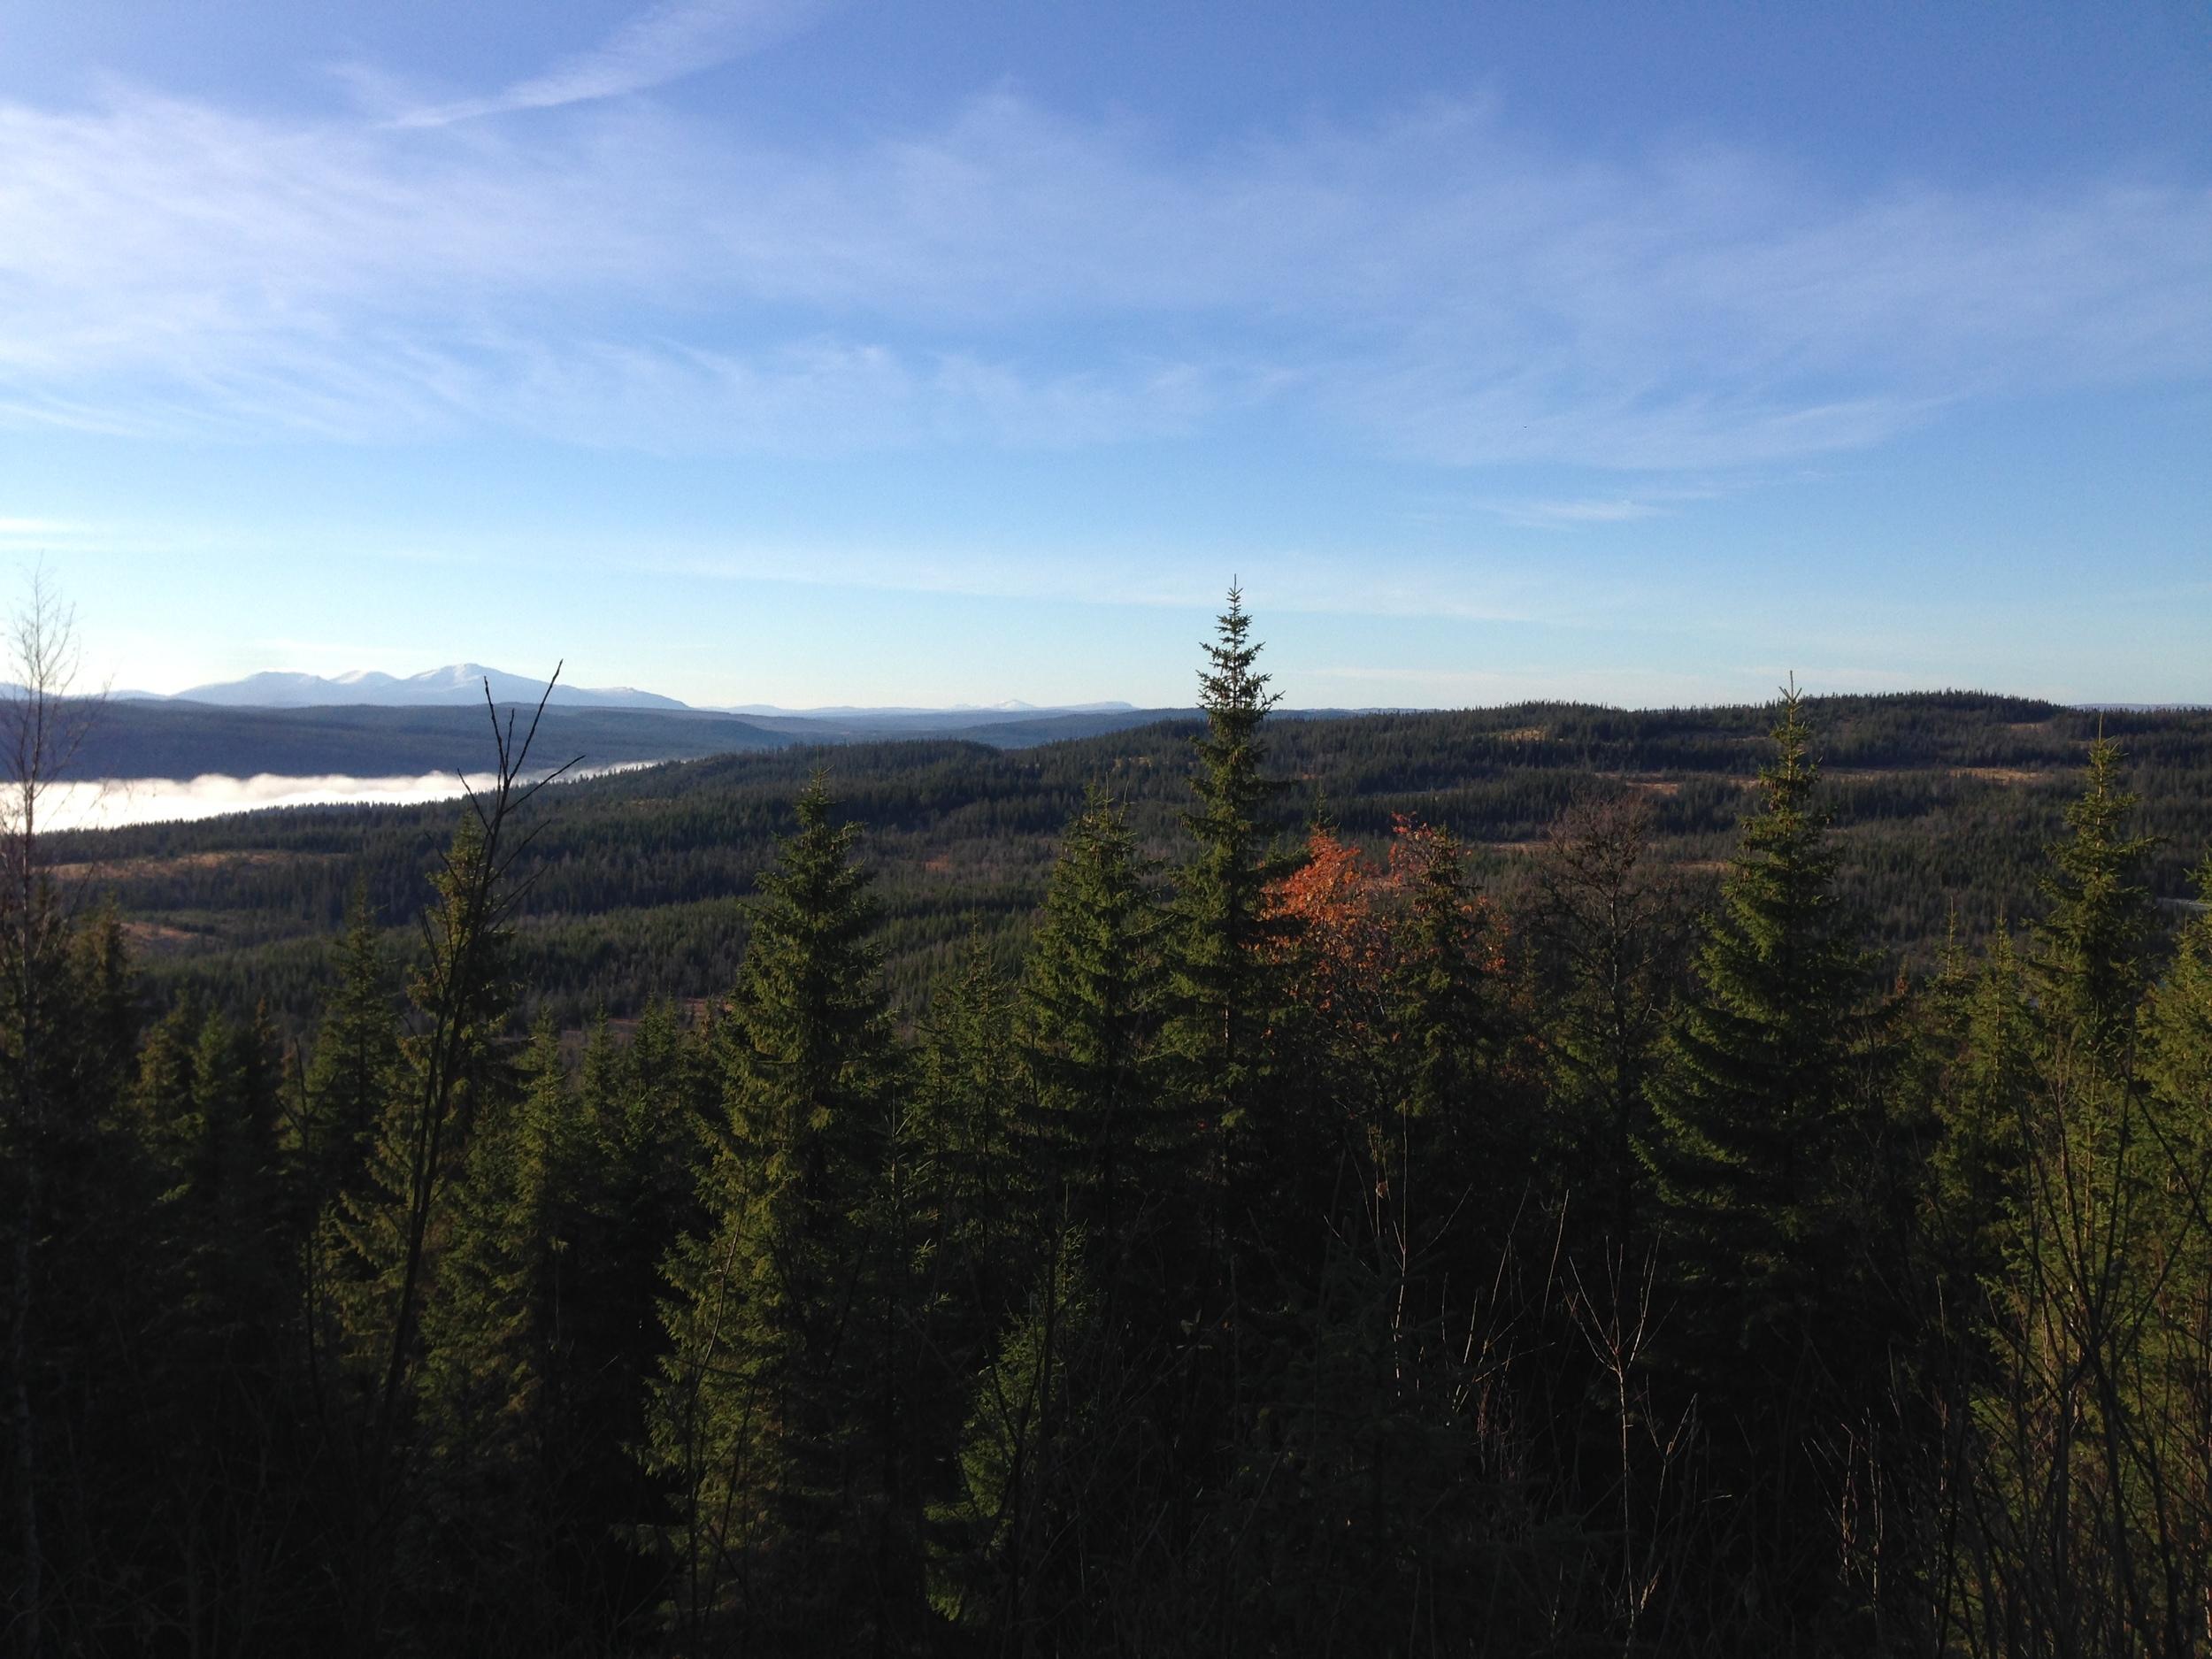 Hey Norway, Sweden has mountains too!